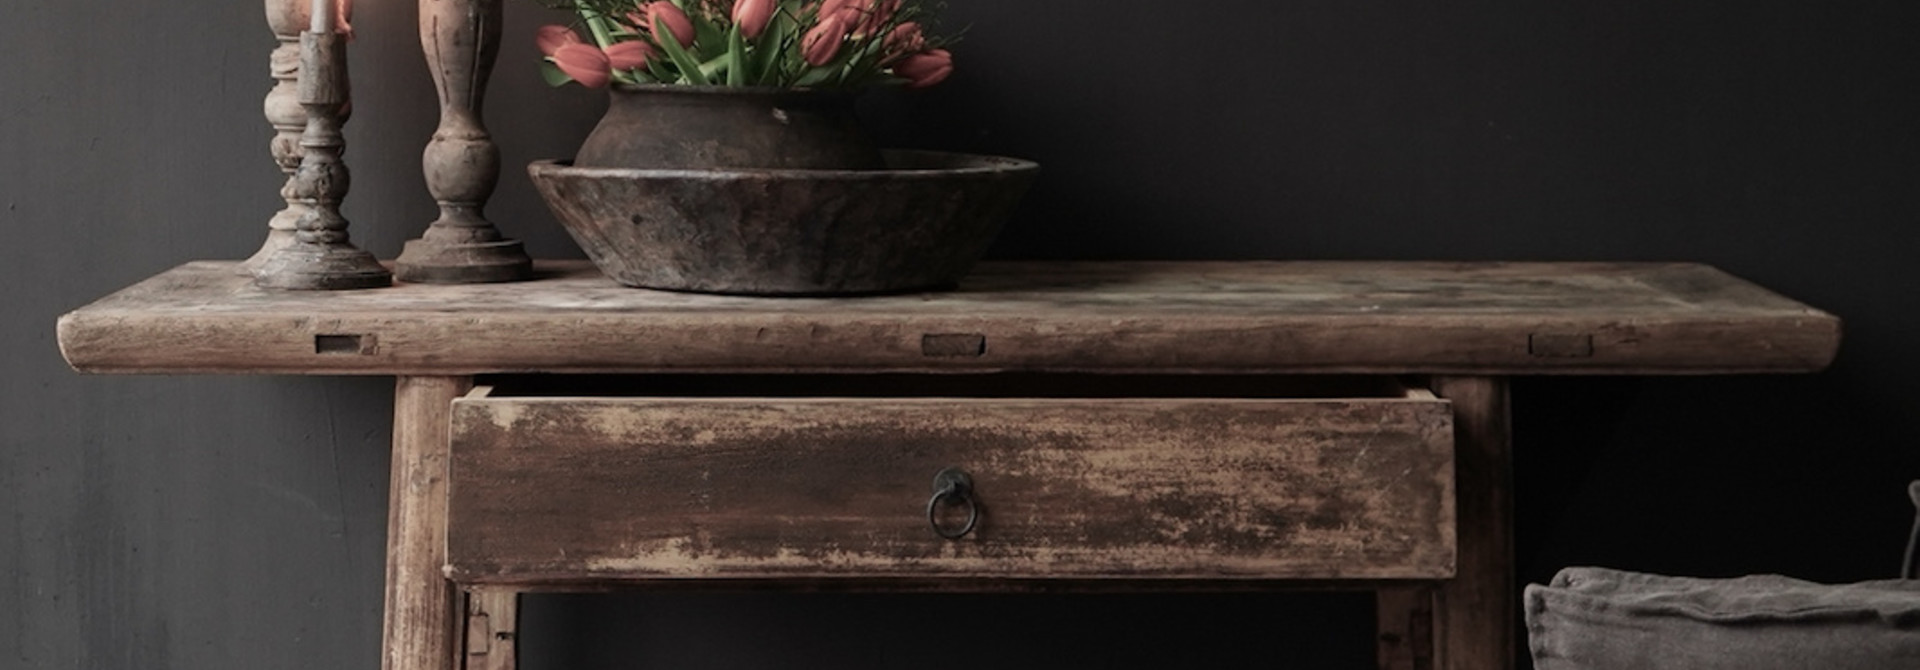 Authentieke Sidetable oftewel muurtafel met een lade